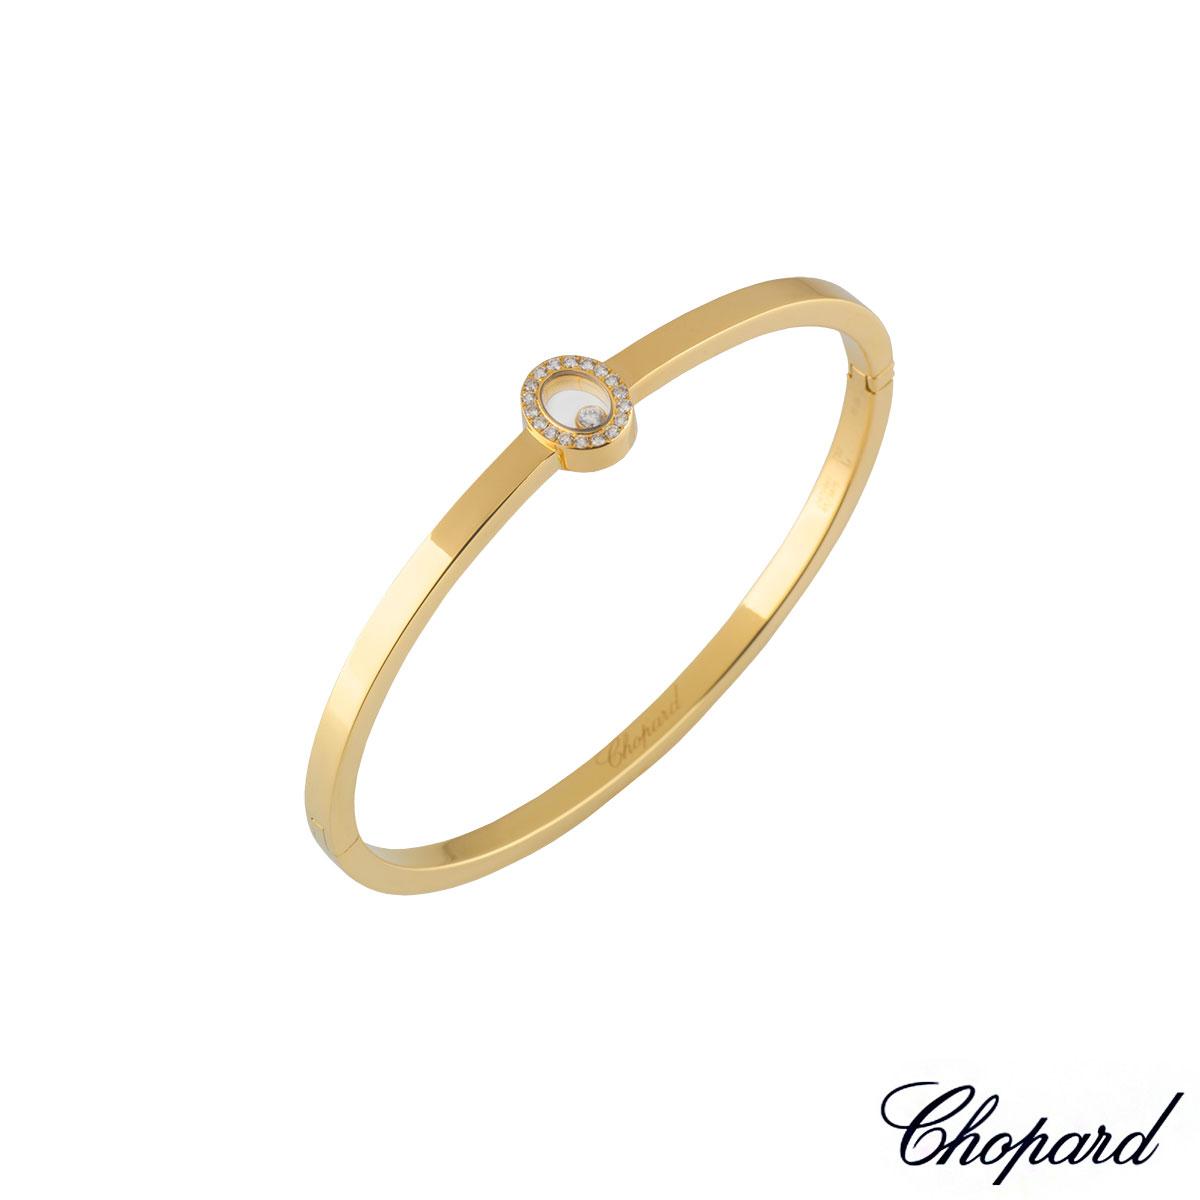 ChopardYellow Gold Happy Diamonds Bangle85/3875-20